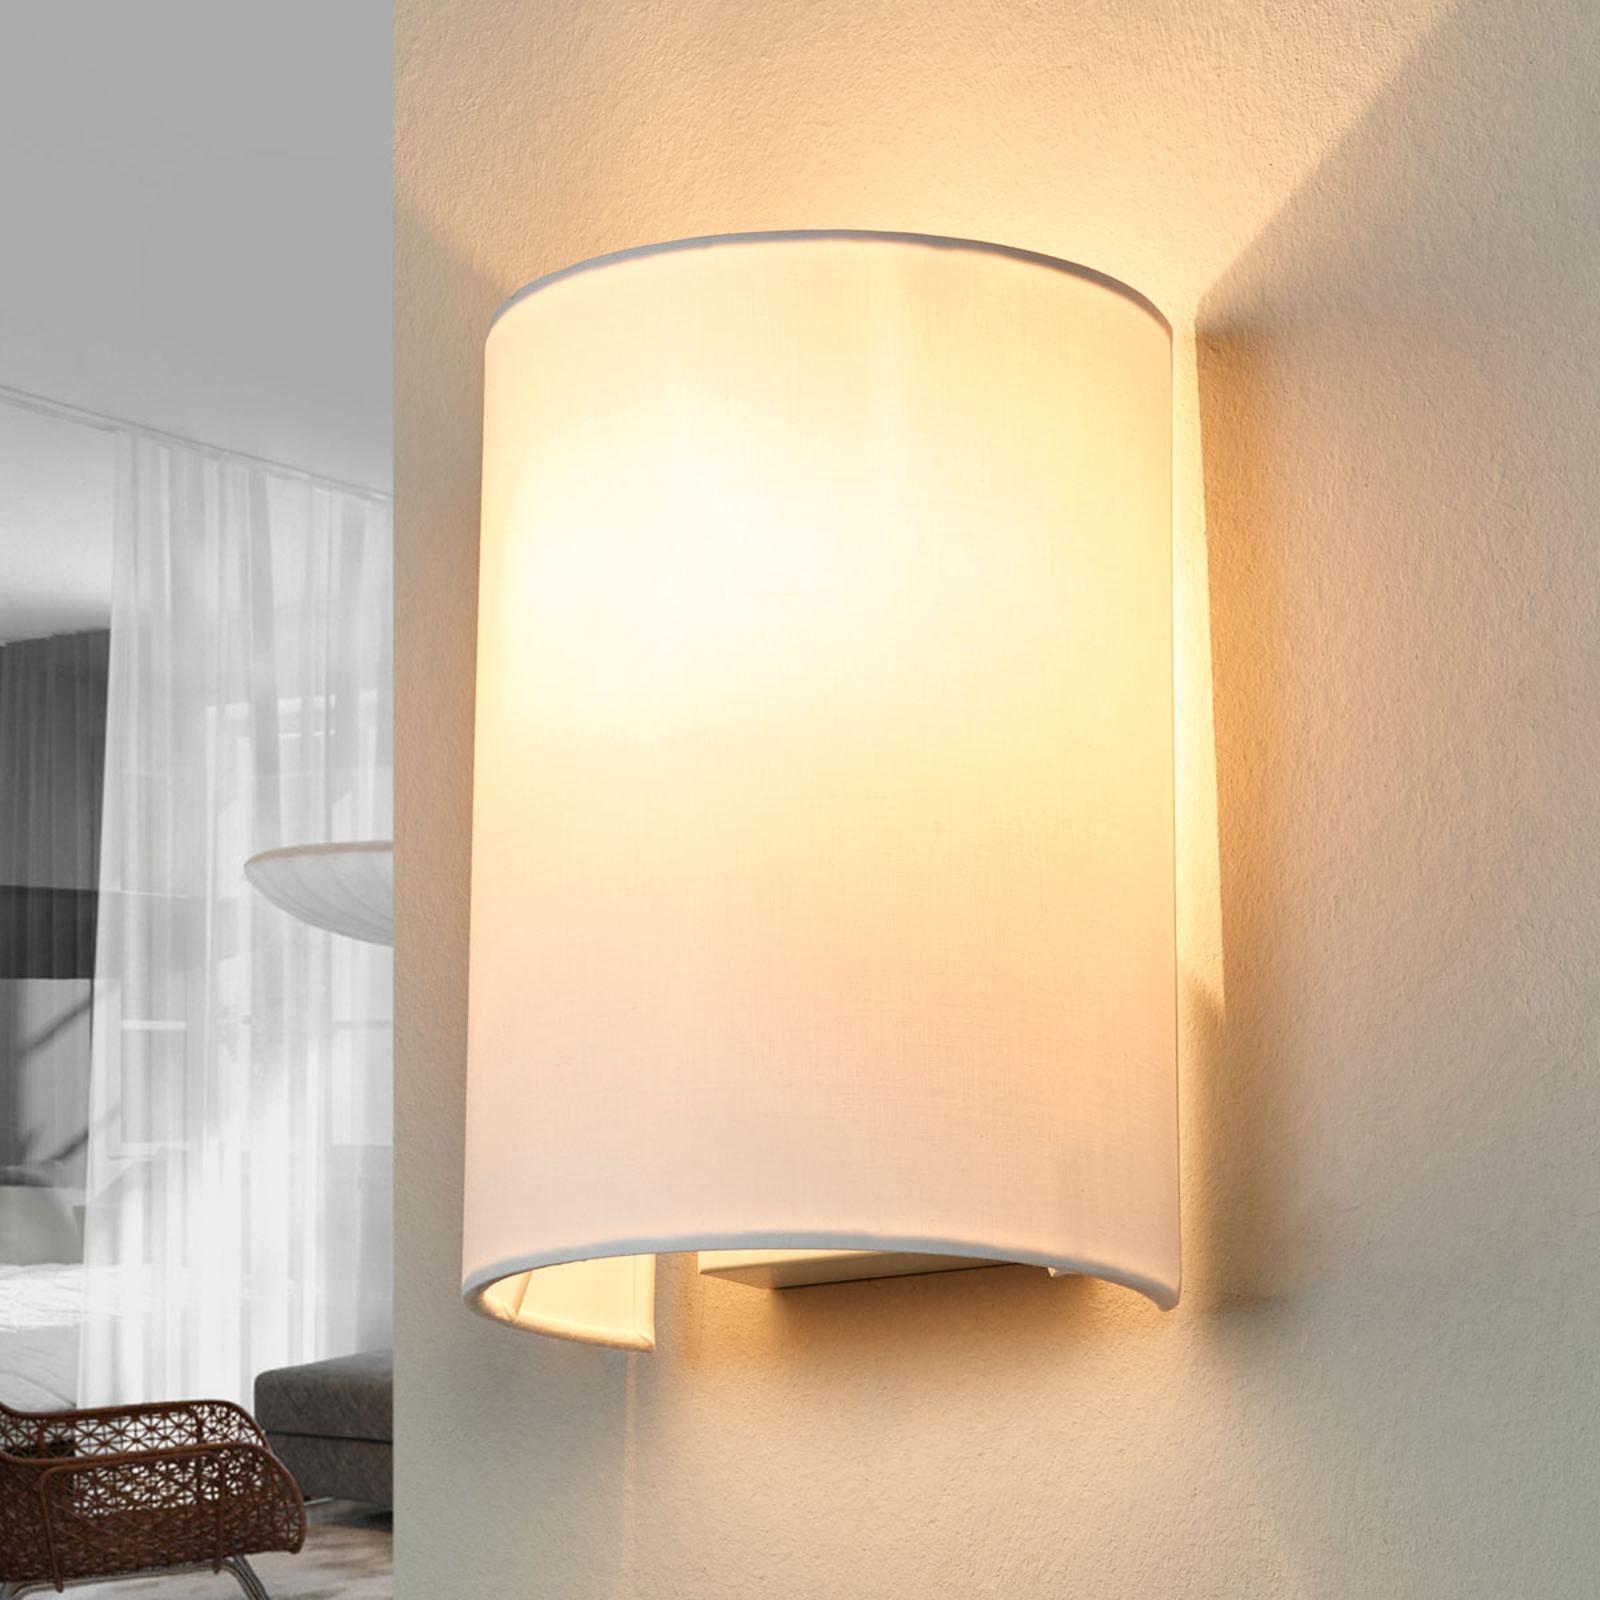 Witte wandlamp van stof Coral